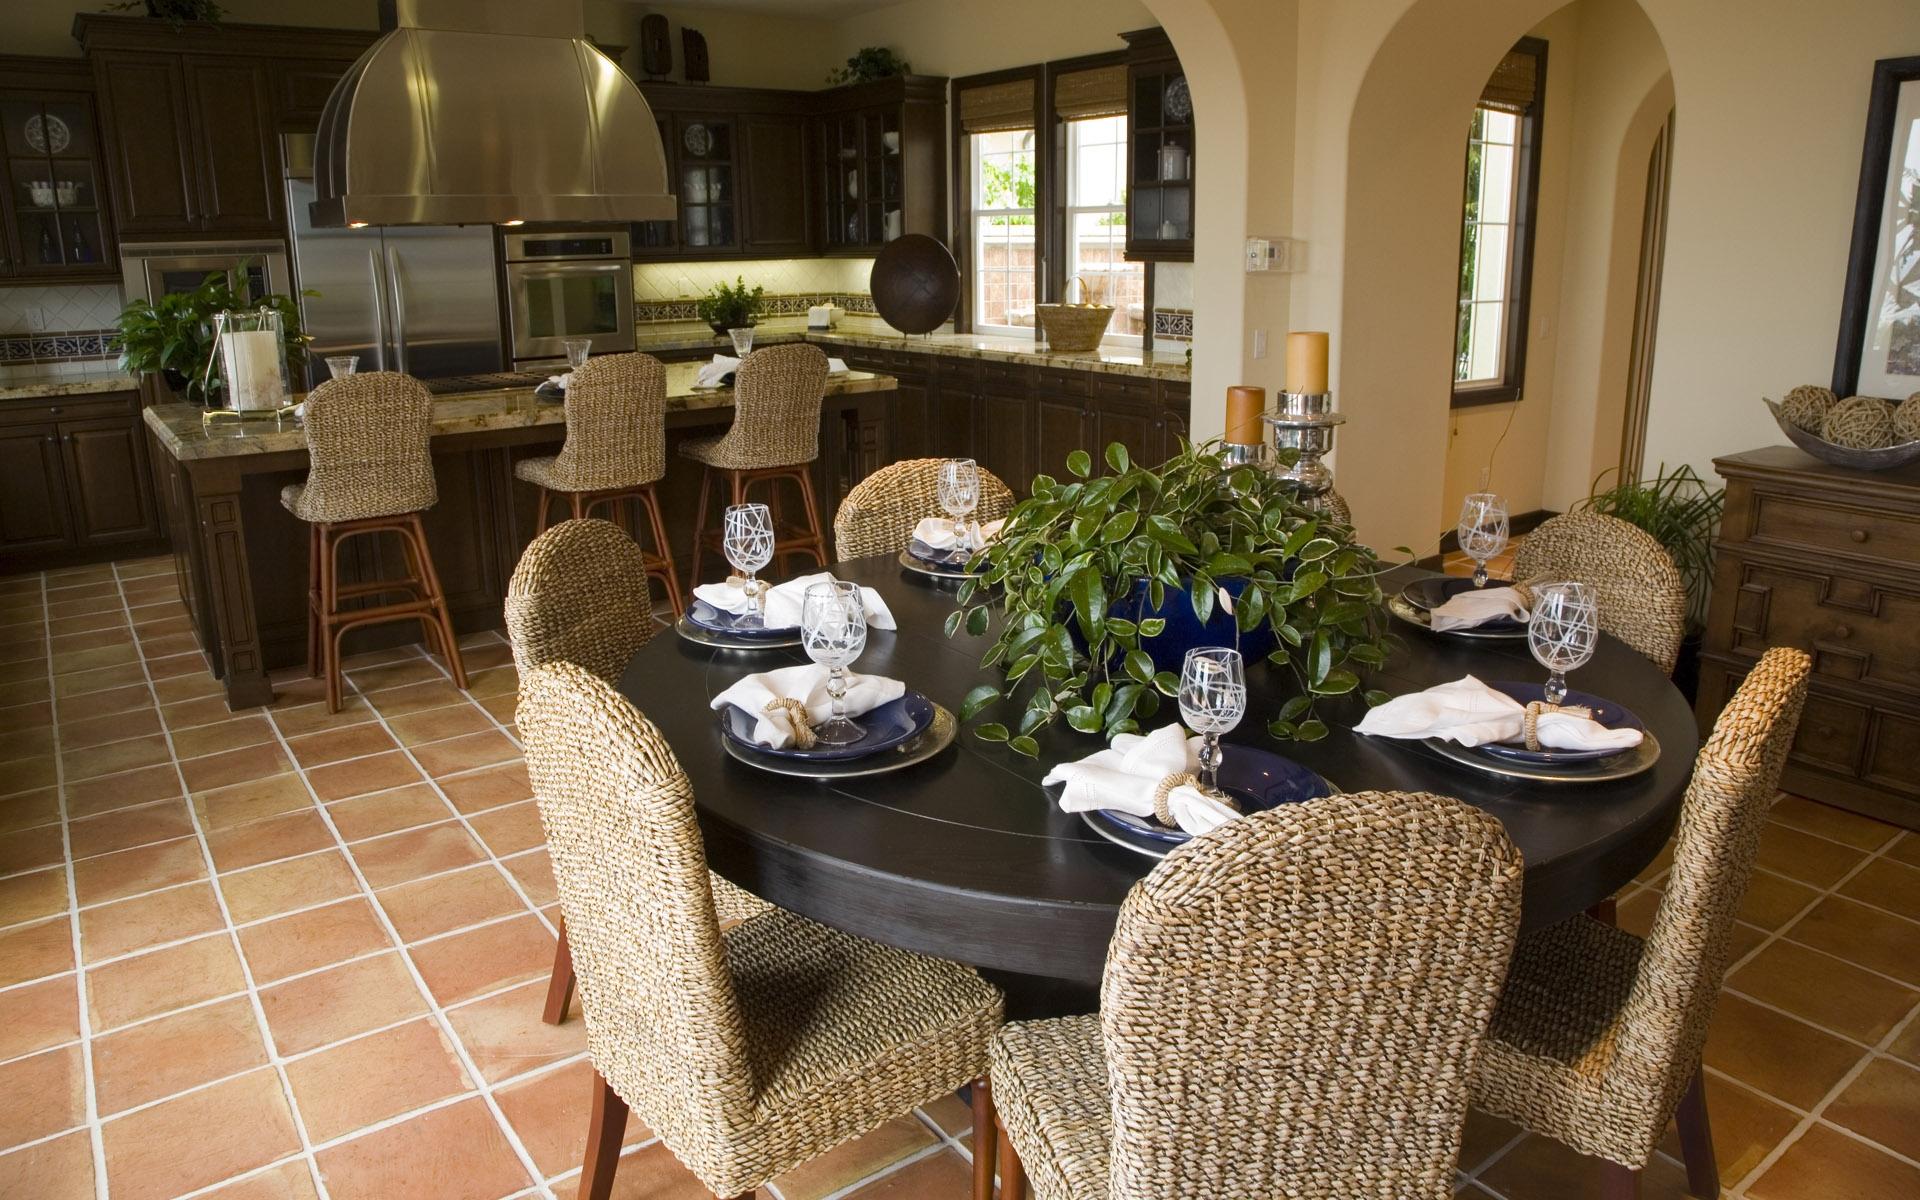 Fondos de pantalla : habitación, interior, cocina, restaurante ...